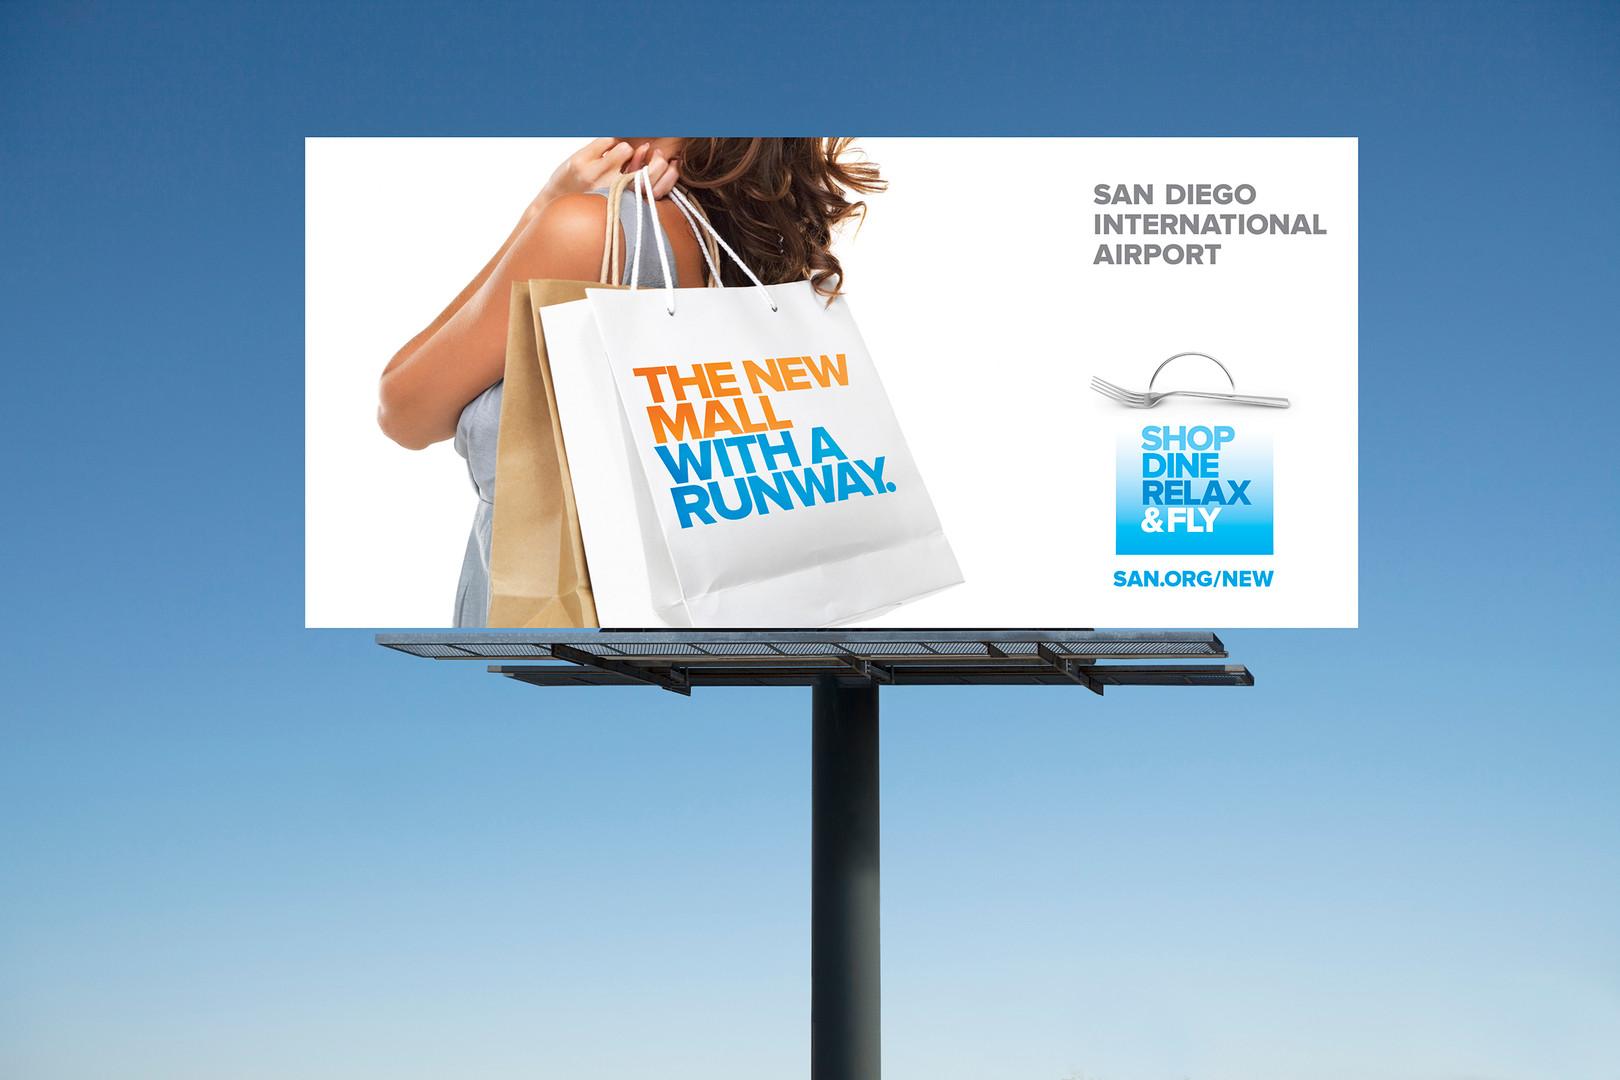 New-Mall_Runway.jpg